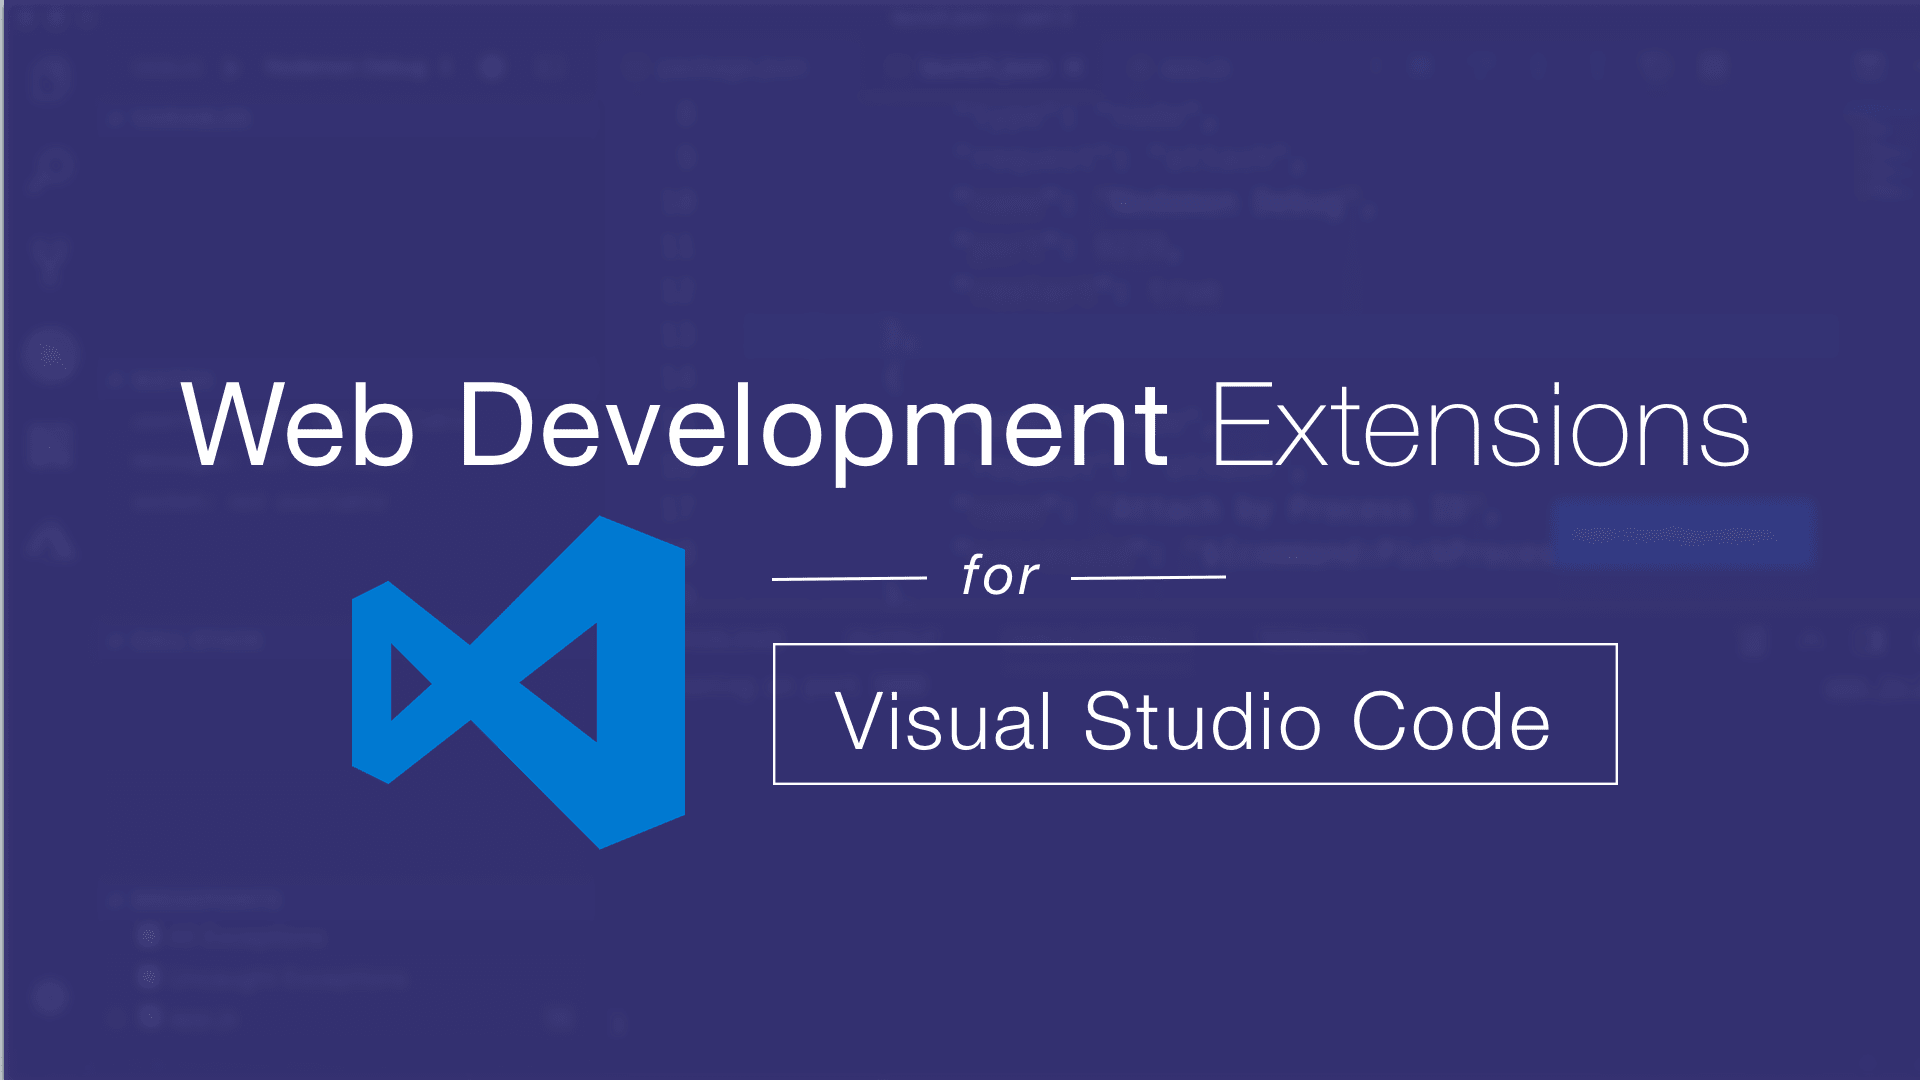 22 Best Visual Studio Code Extensions for Web Development ― Scotch io